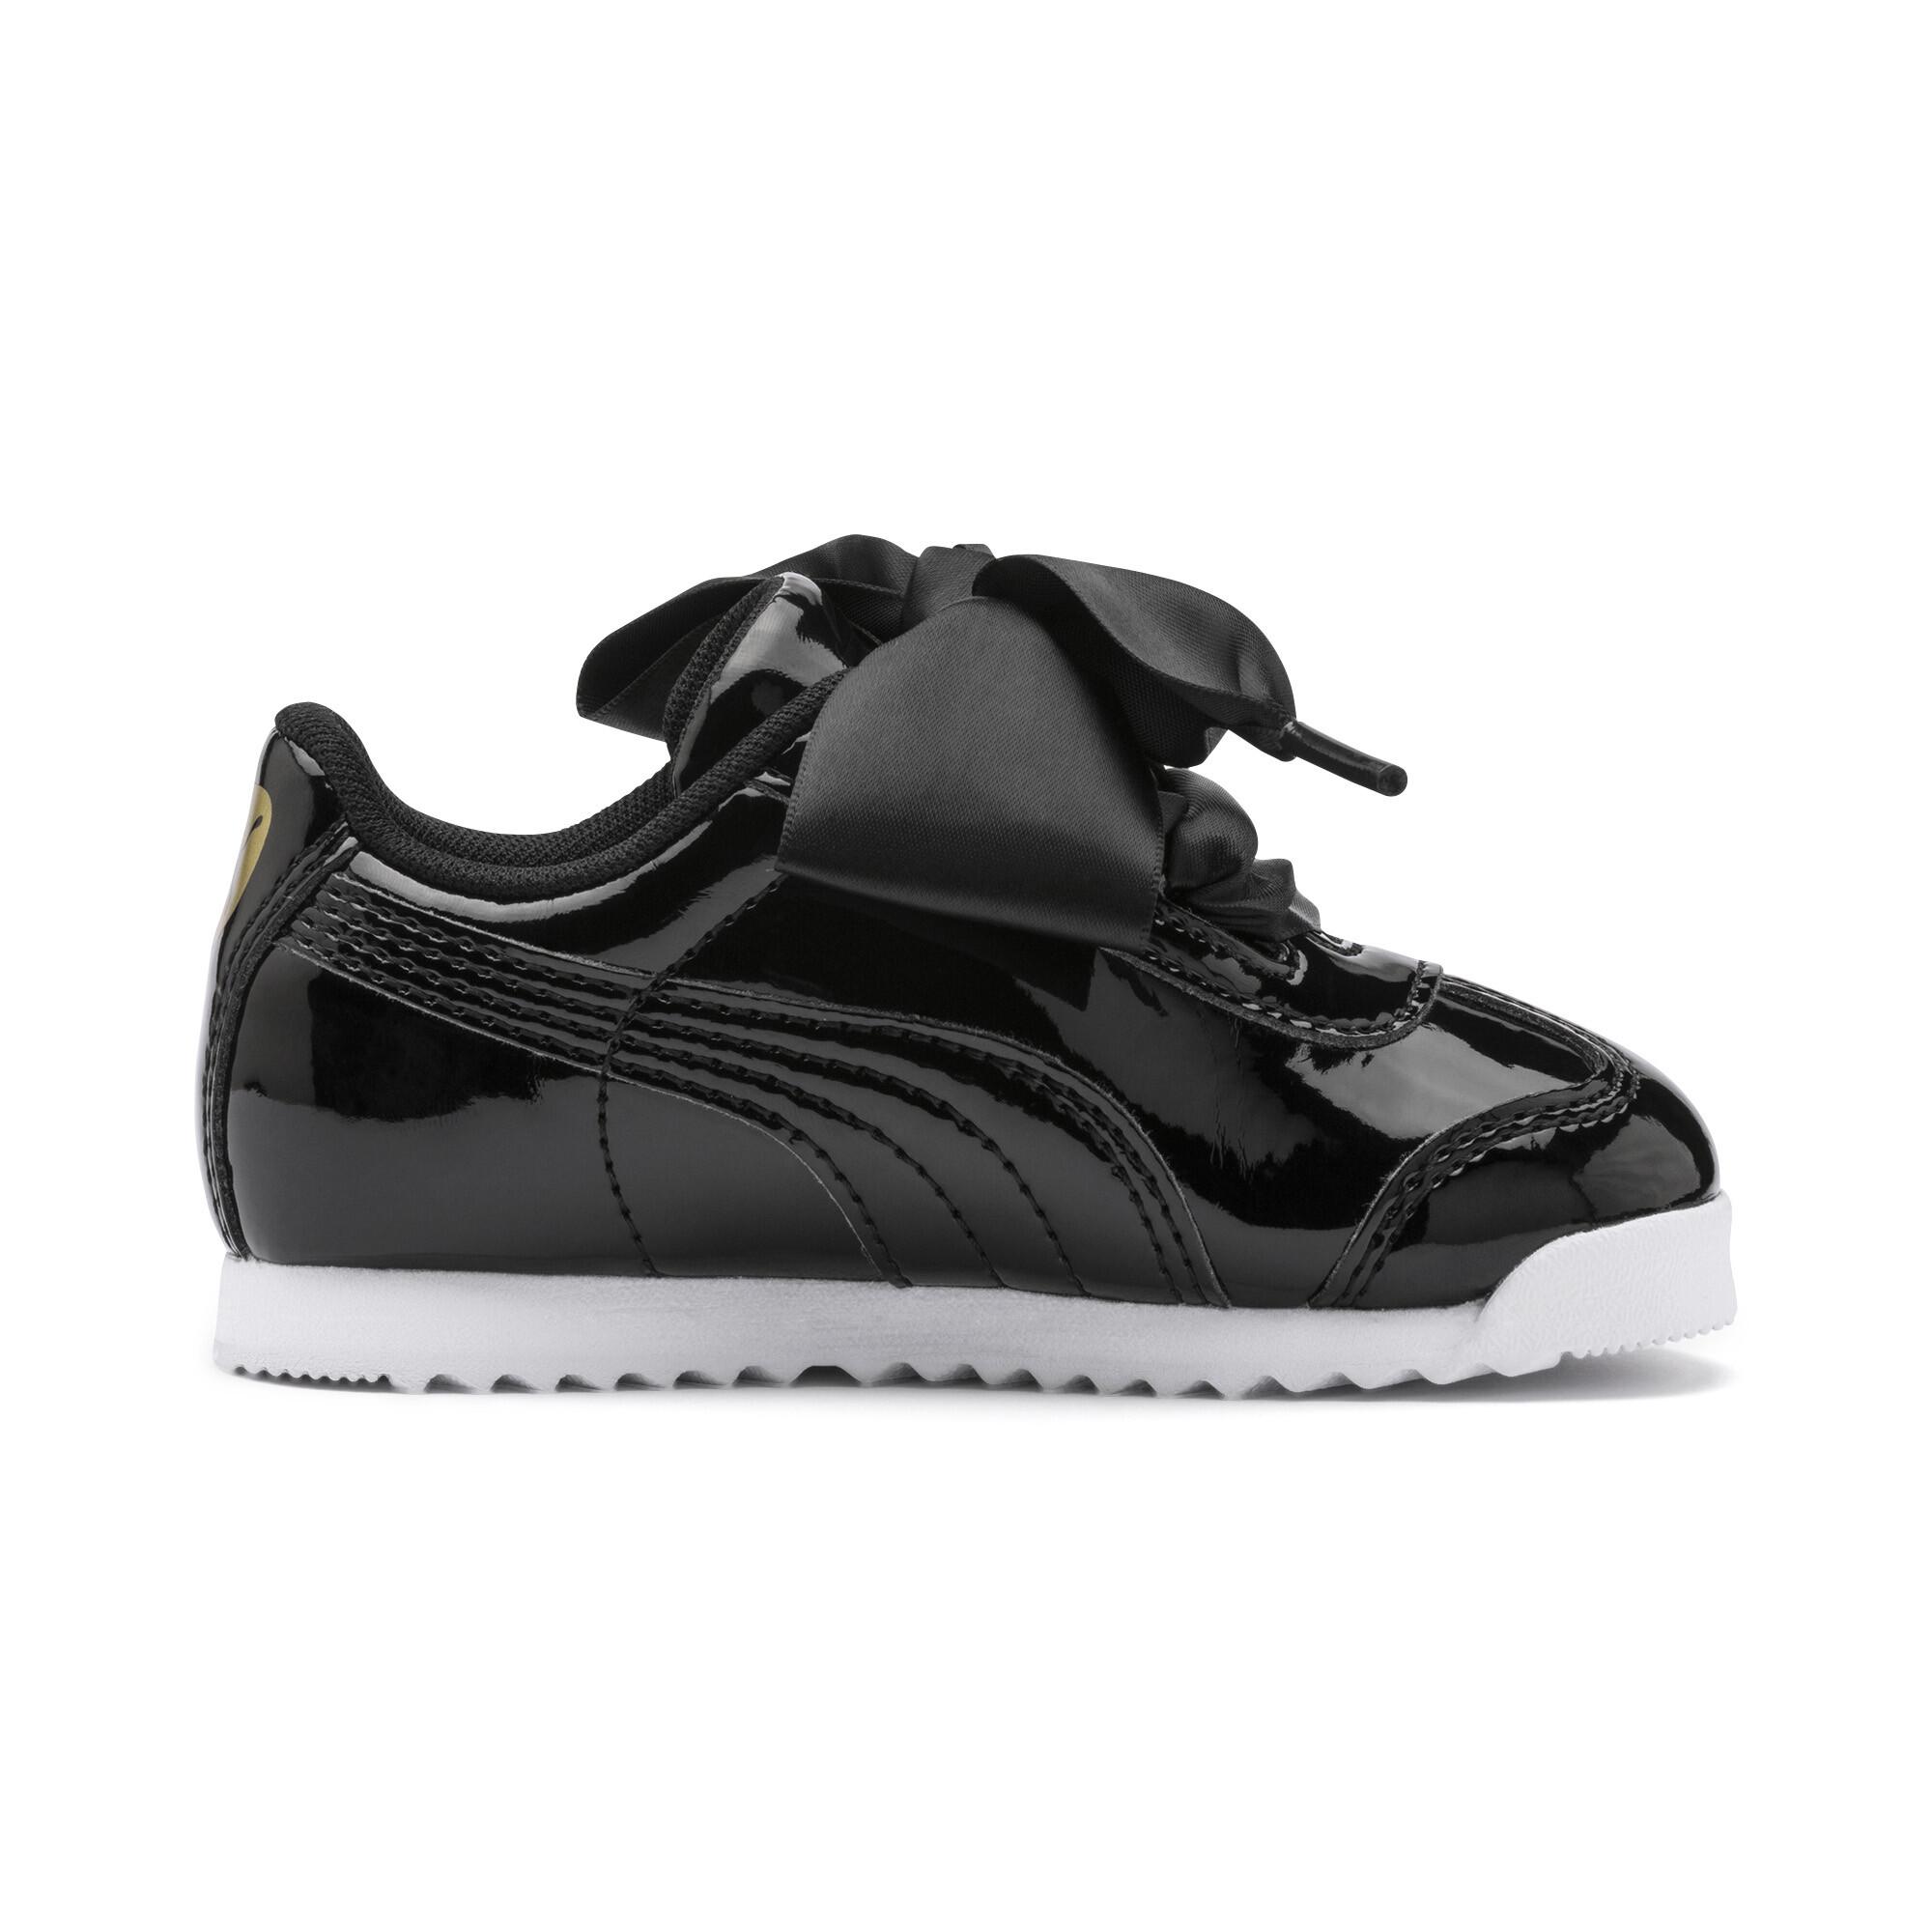 PUMA-Roma-Heart-Patent-Toddler-Shoes-Girls-Shoe-Kids thumbnail 6